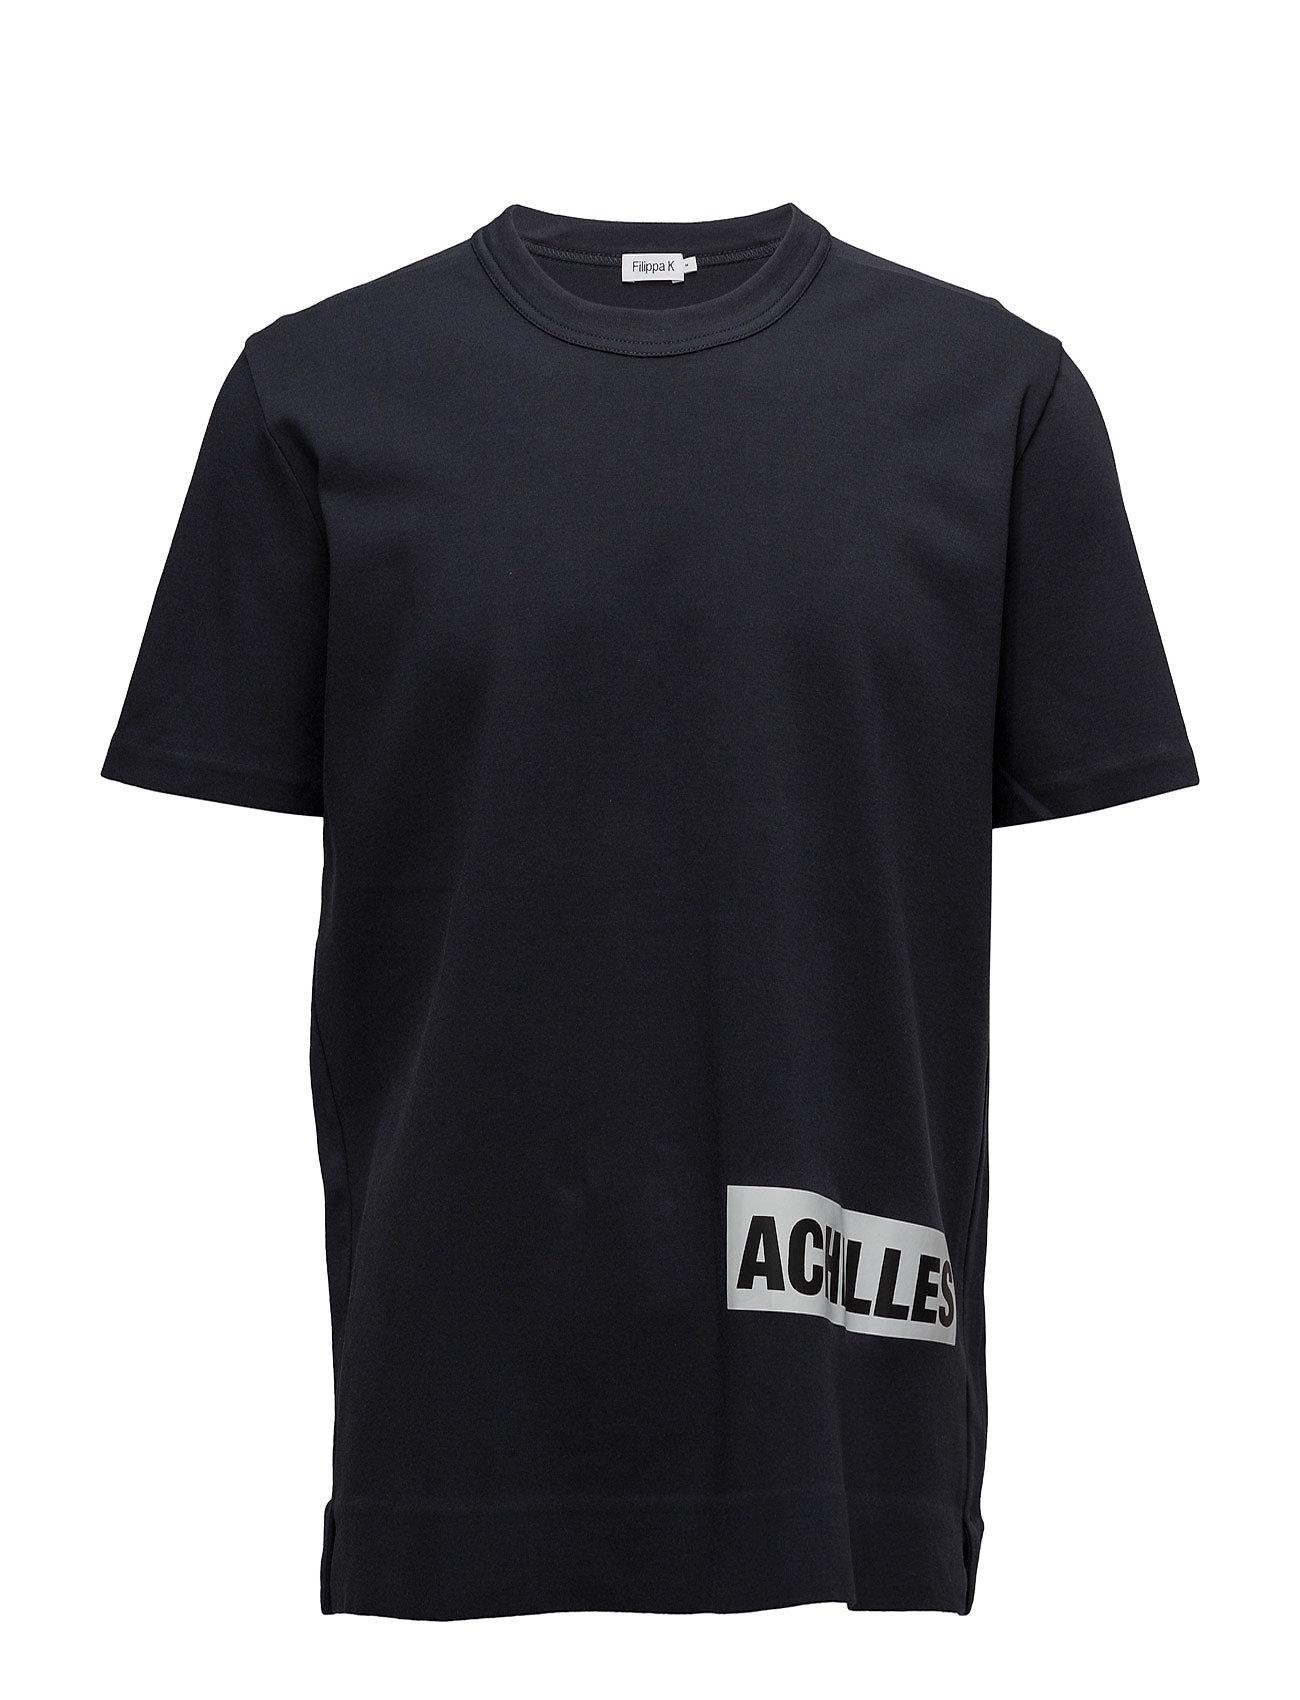 M. Adrian Cotton Interlock Tee Filippa K T-shirts til Mænd i Navy blå